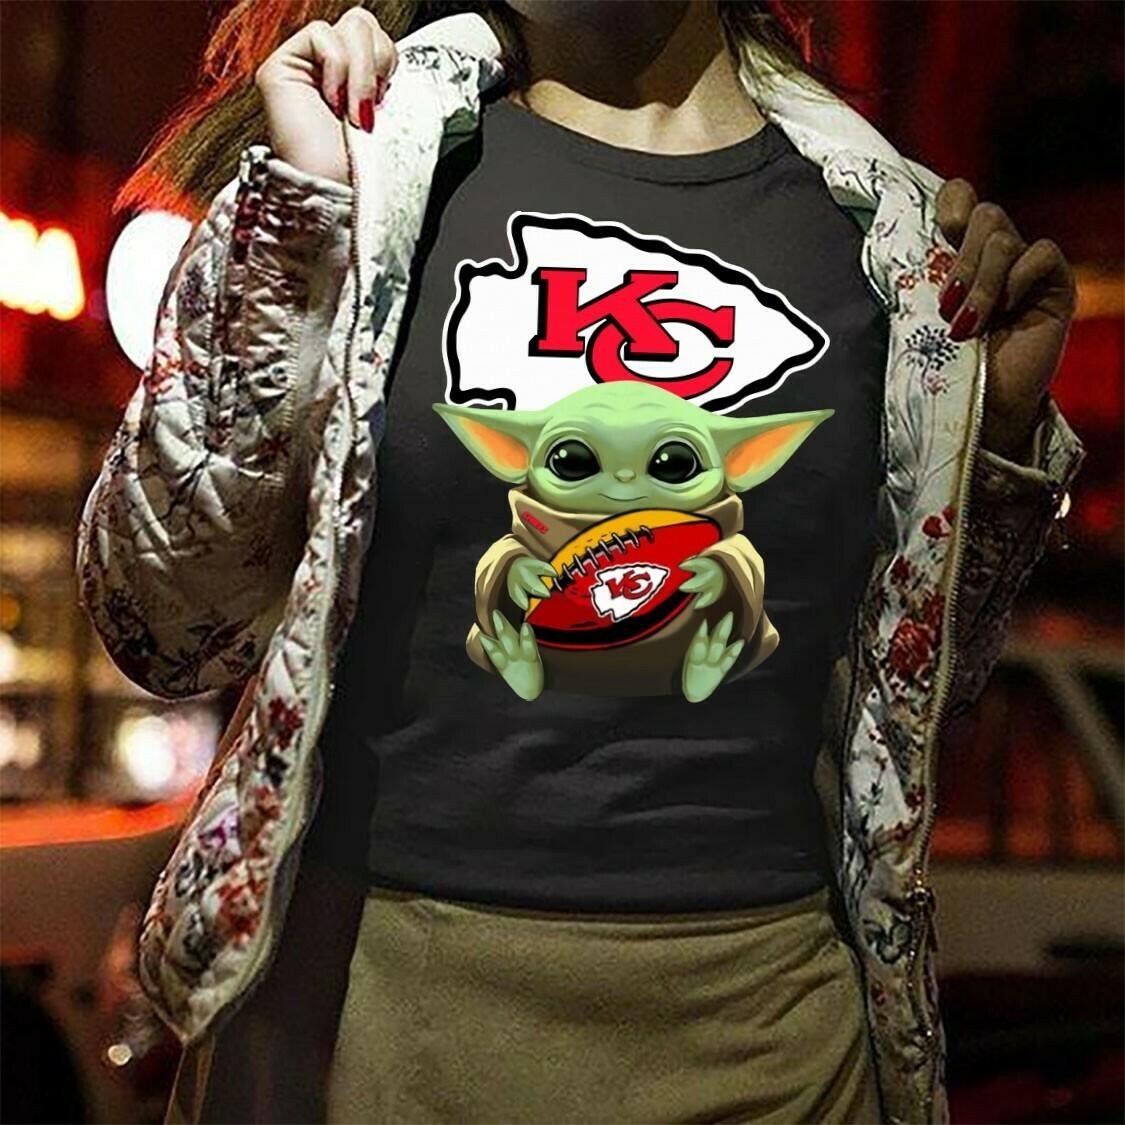 Kansas City Chiefs Baby Yoda Star Wars The Mandalorian The Child First Memories Floating Football Team Dad Mon Kid Fan Gift T-Shirt Long Sleeve Sweatshirt Hoodie Jolly Family Gifts